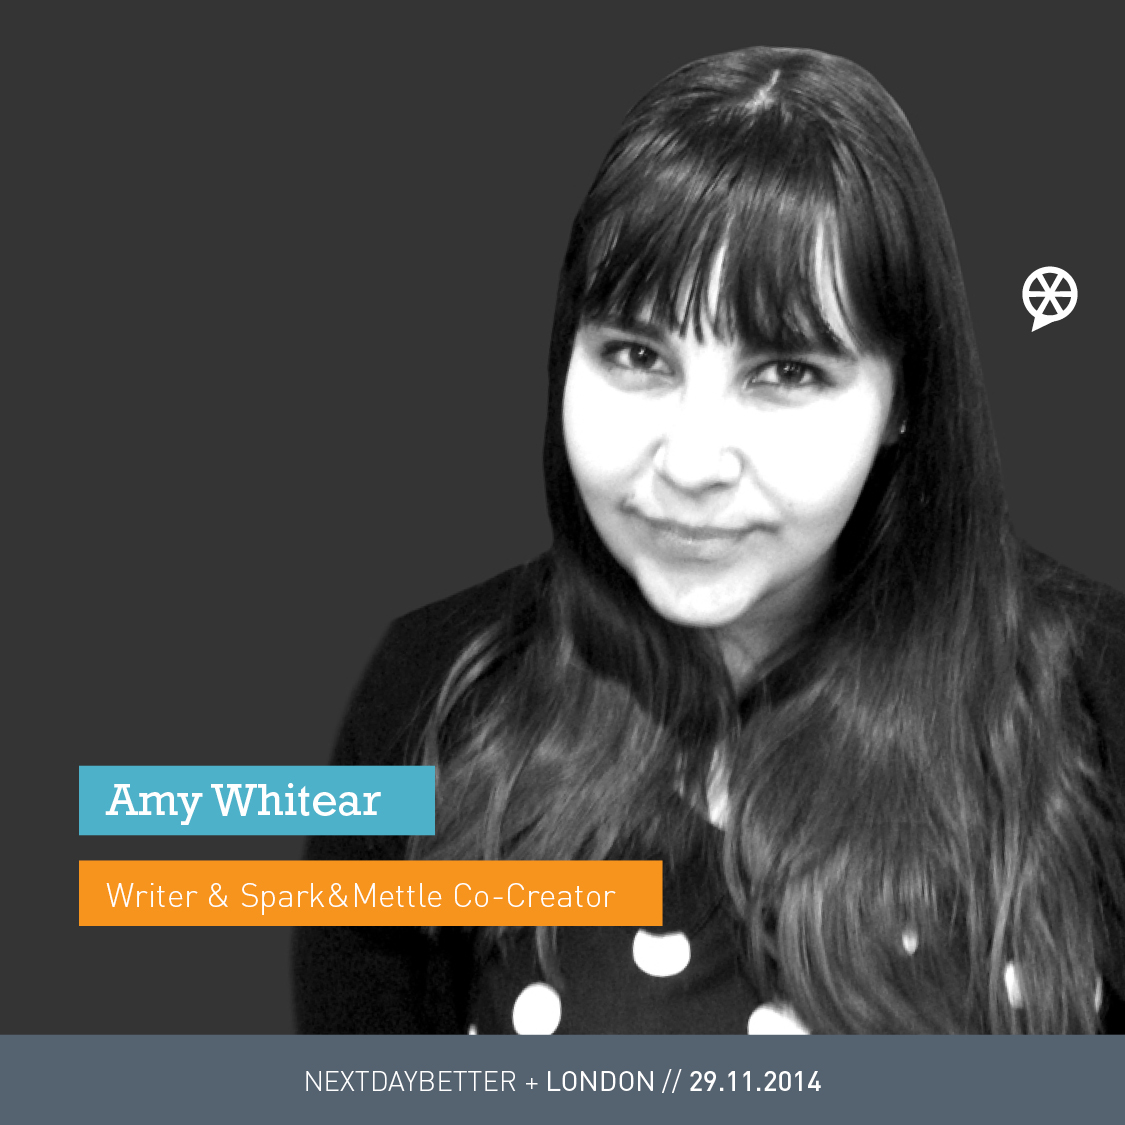 Amy Whitear